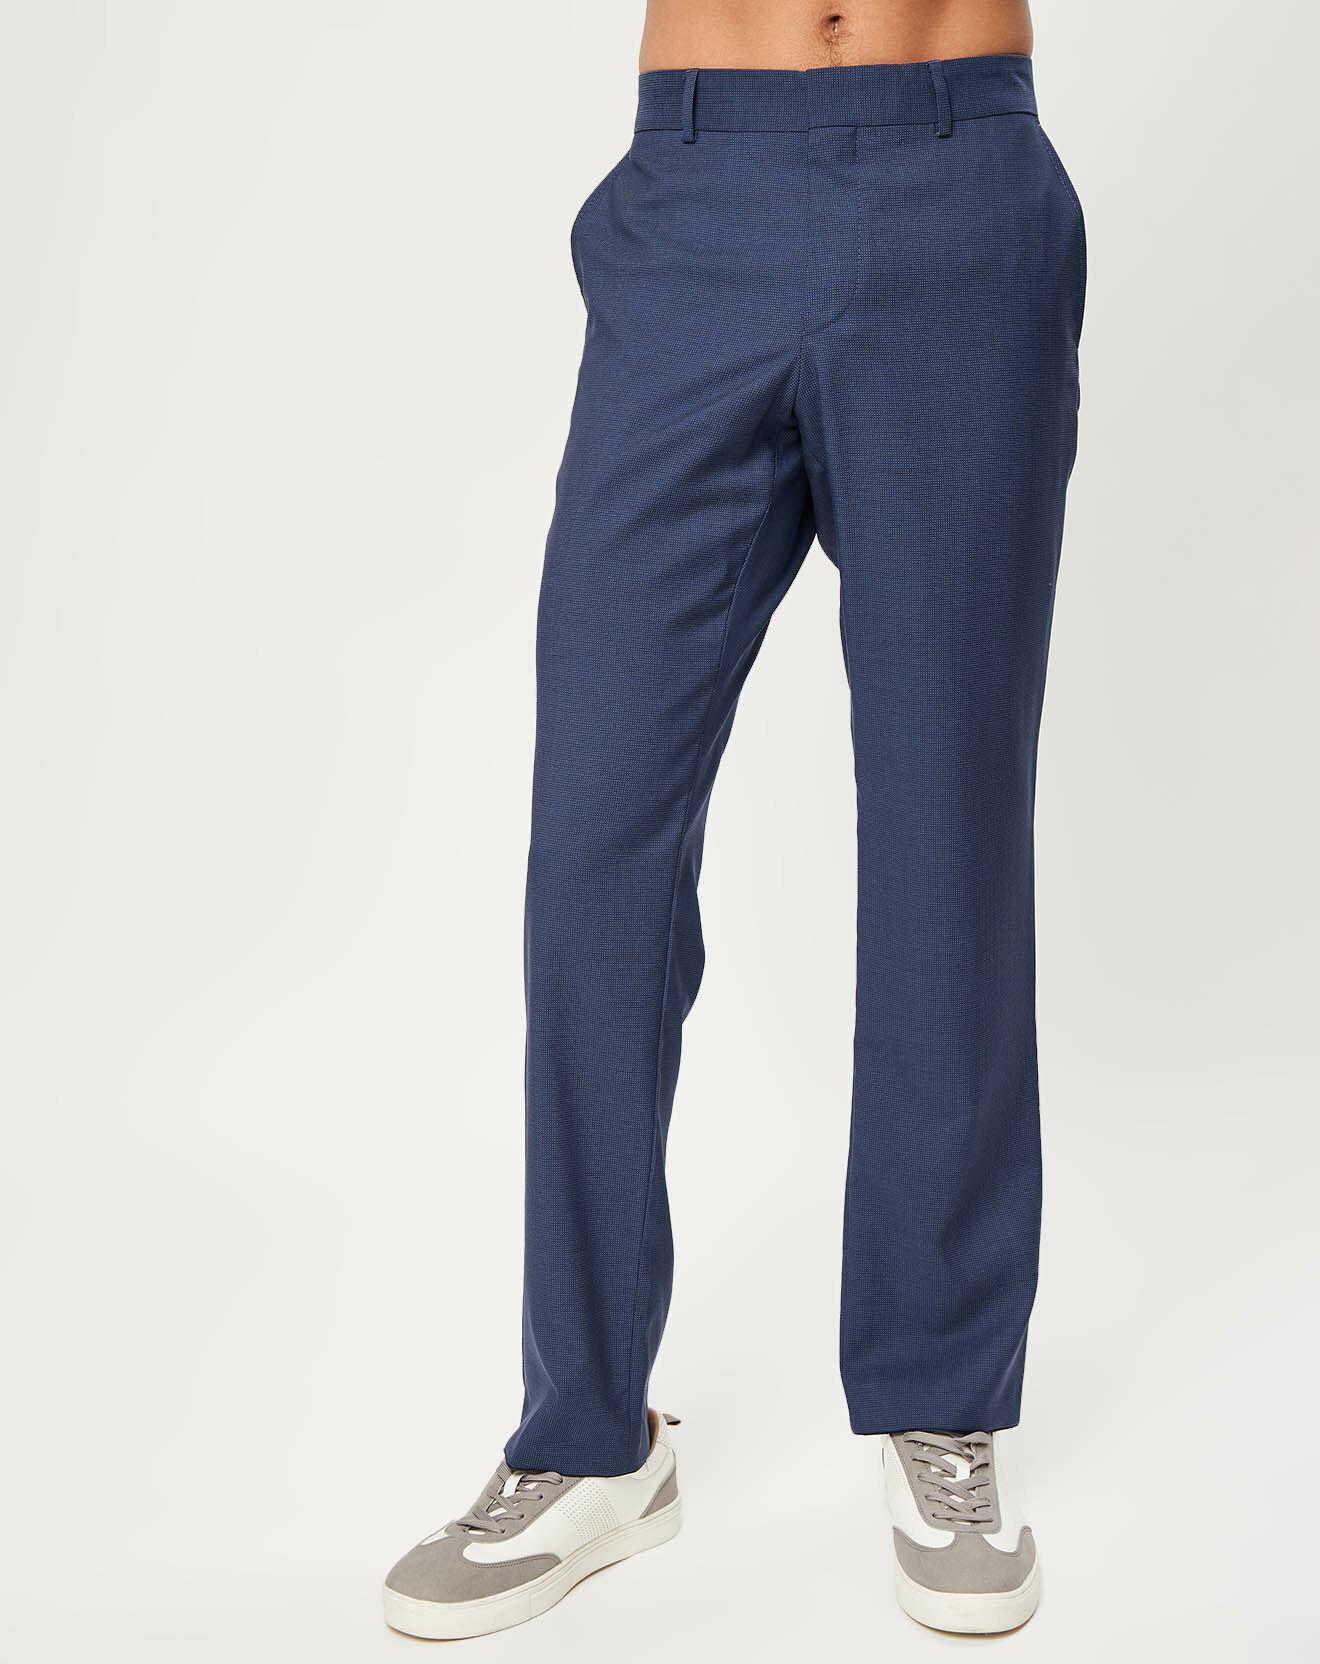 Pantalon de Costume 100% Laine Rhm - Tommy Hilfiger - Modalova